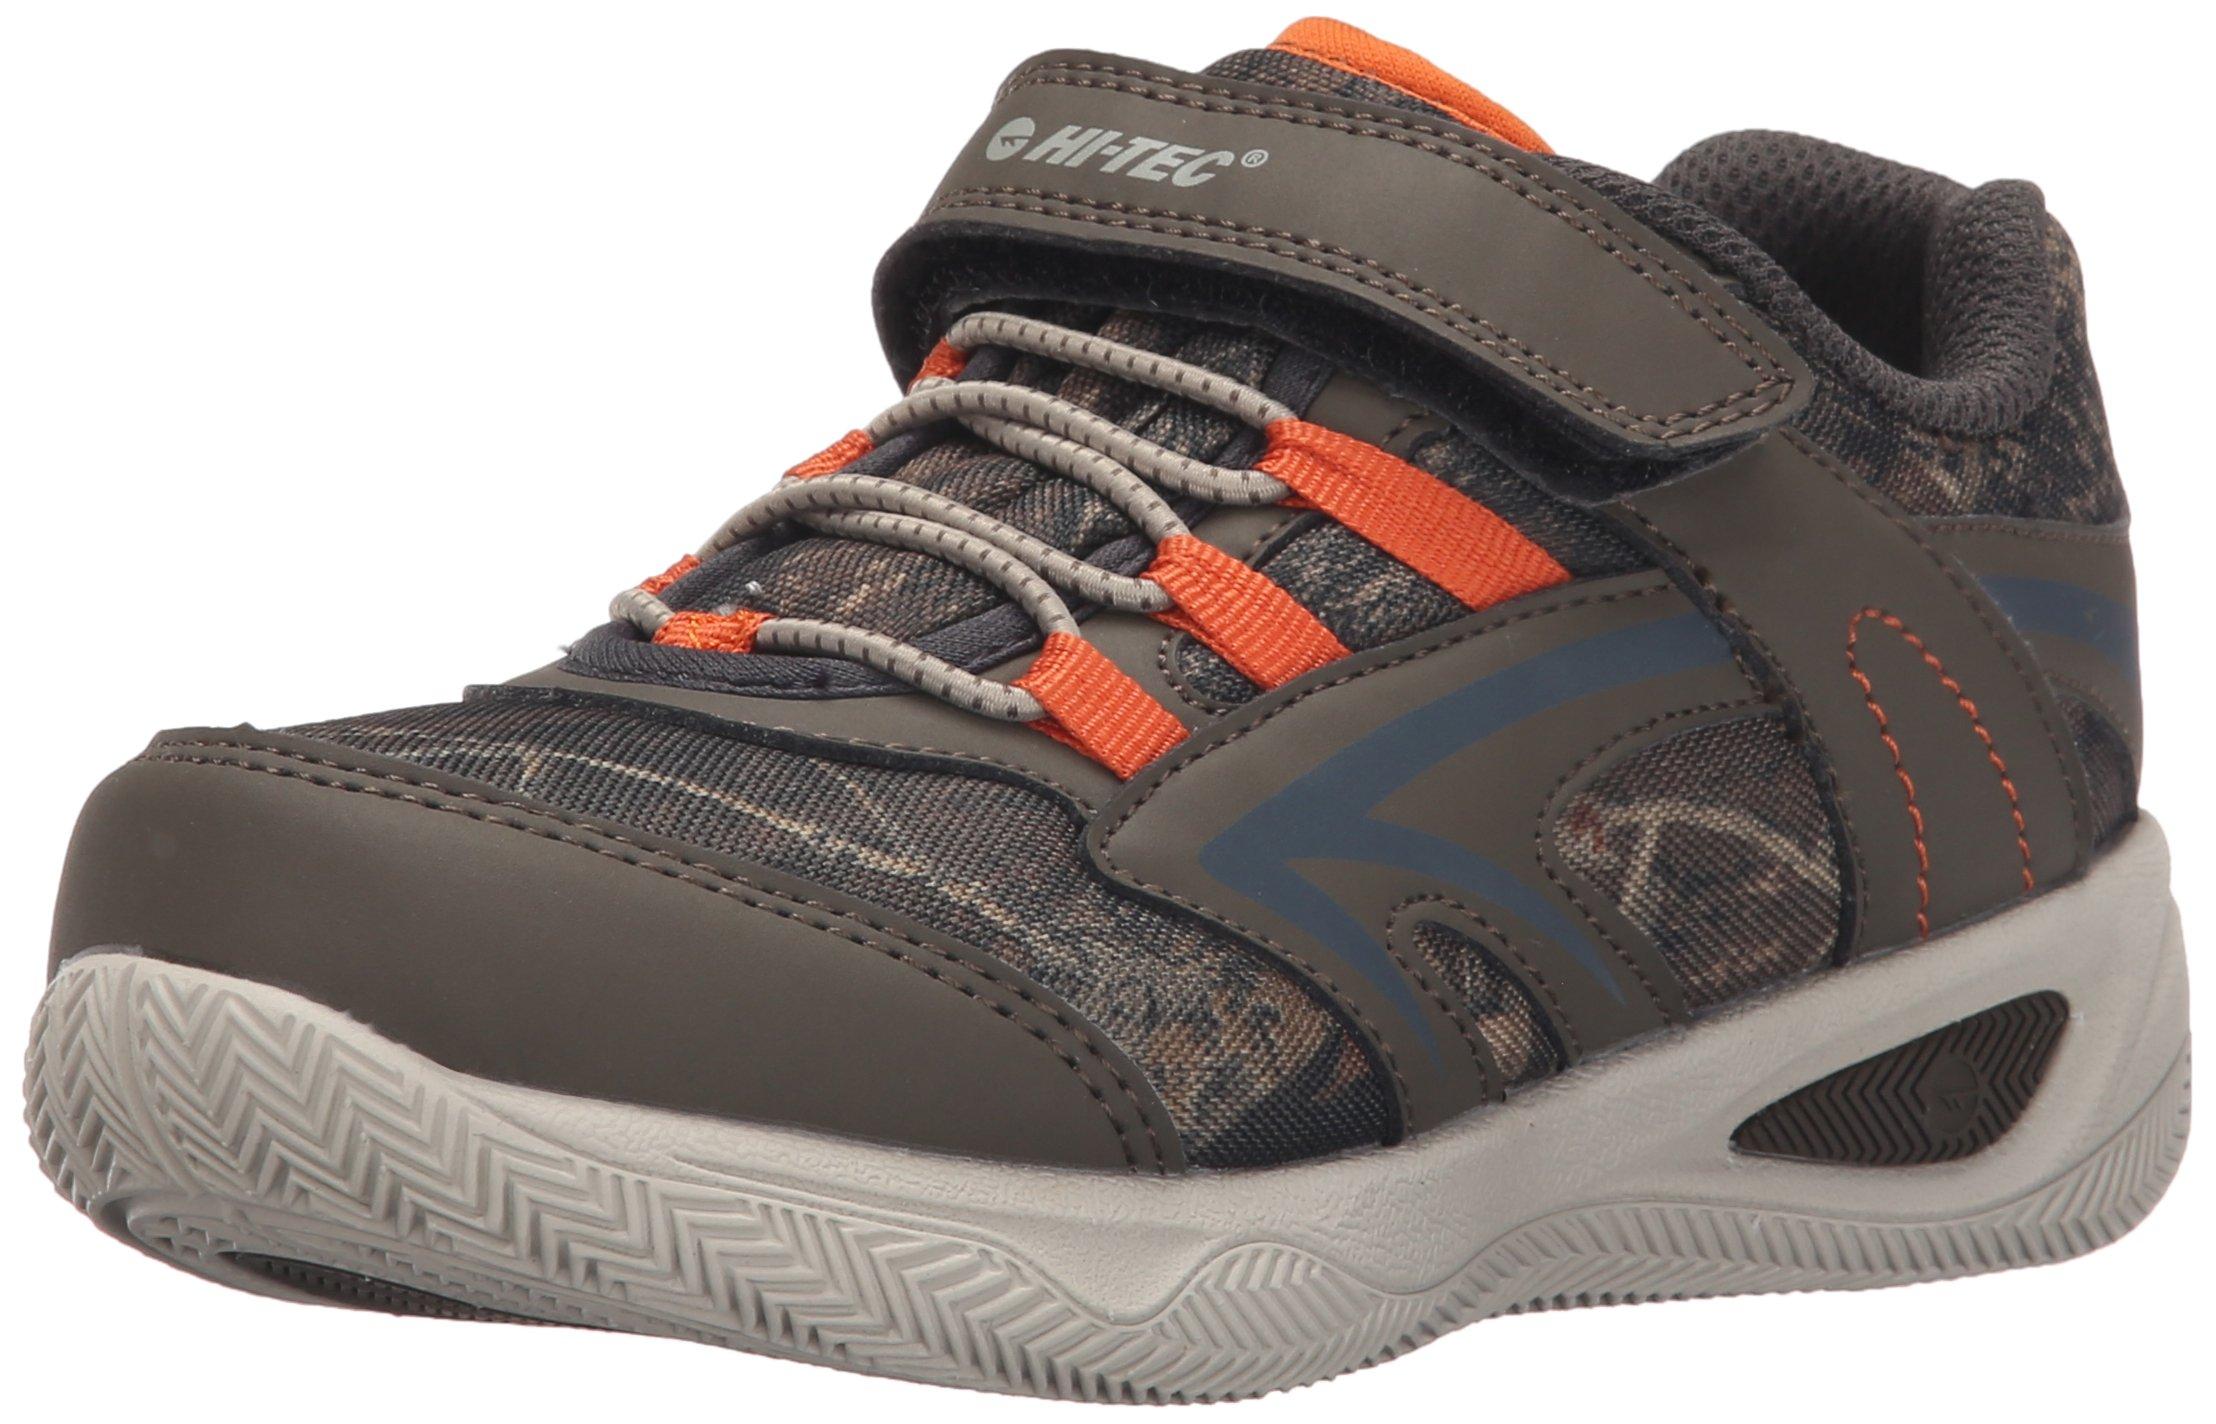 Hi-Tec Thunder JR Multi sport shoe (Little Kid/Big Kid), Olive/Camo/Burnt Orange, 10 M US Little Kid